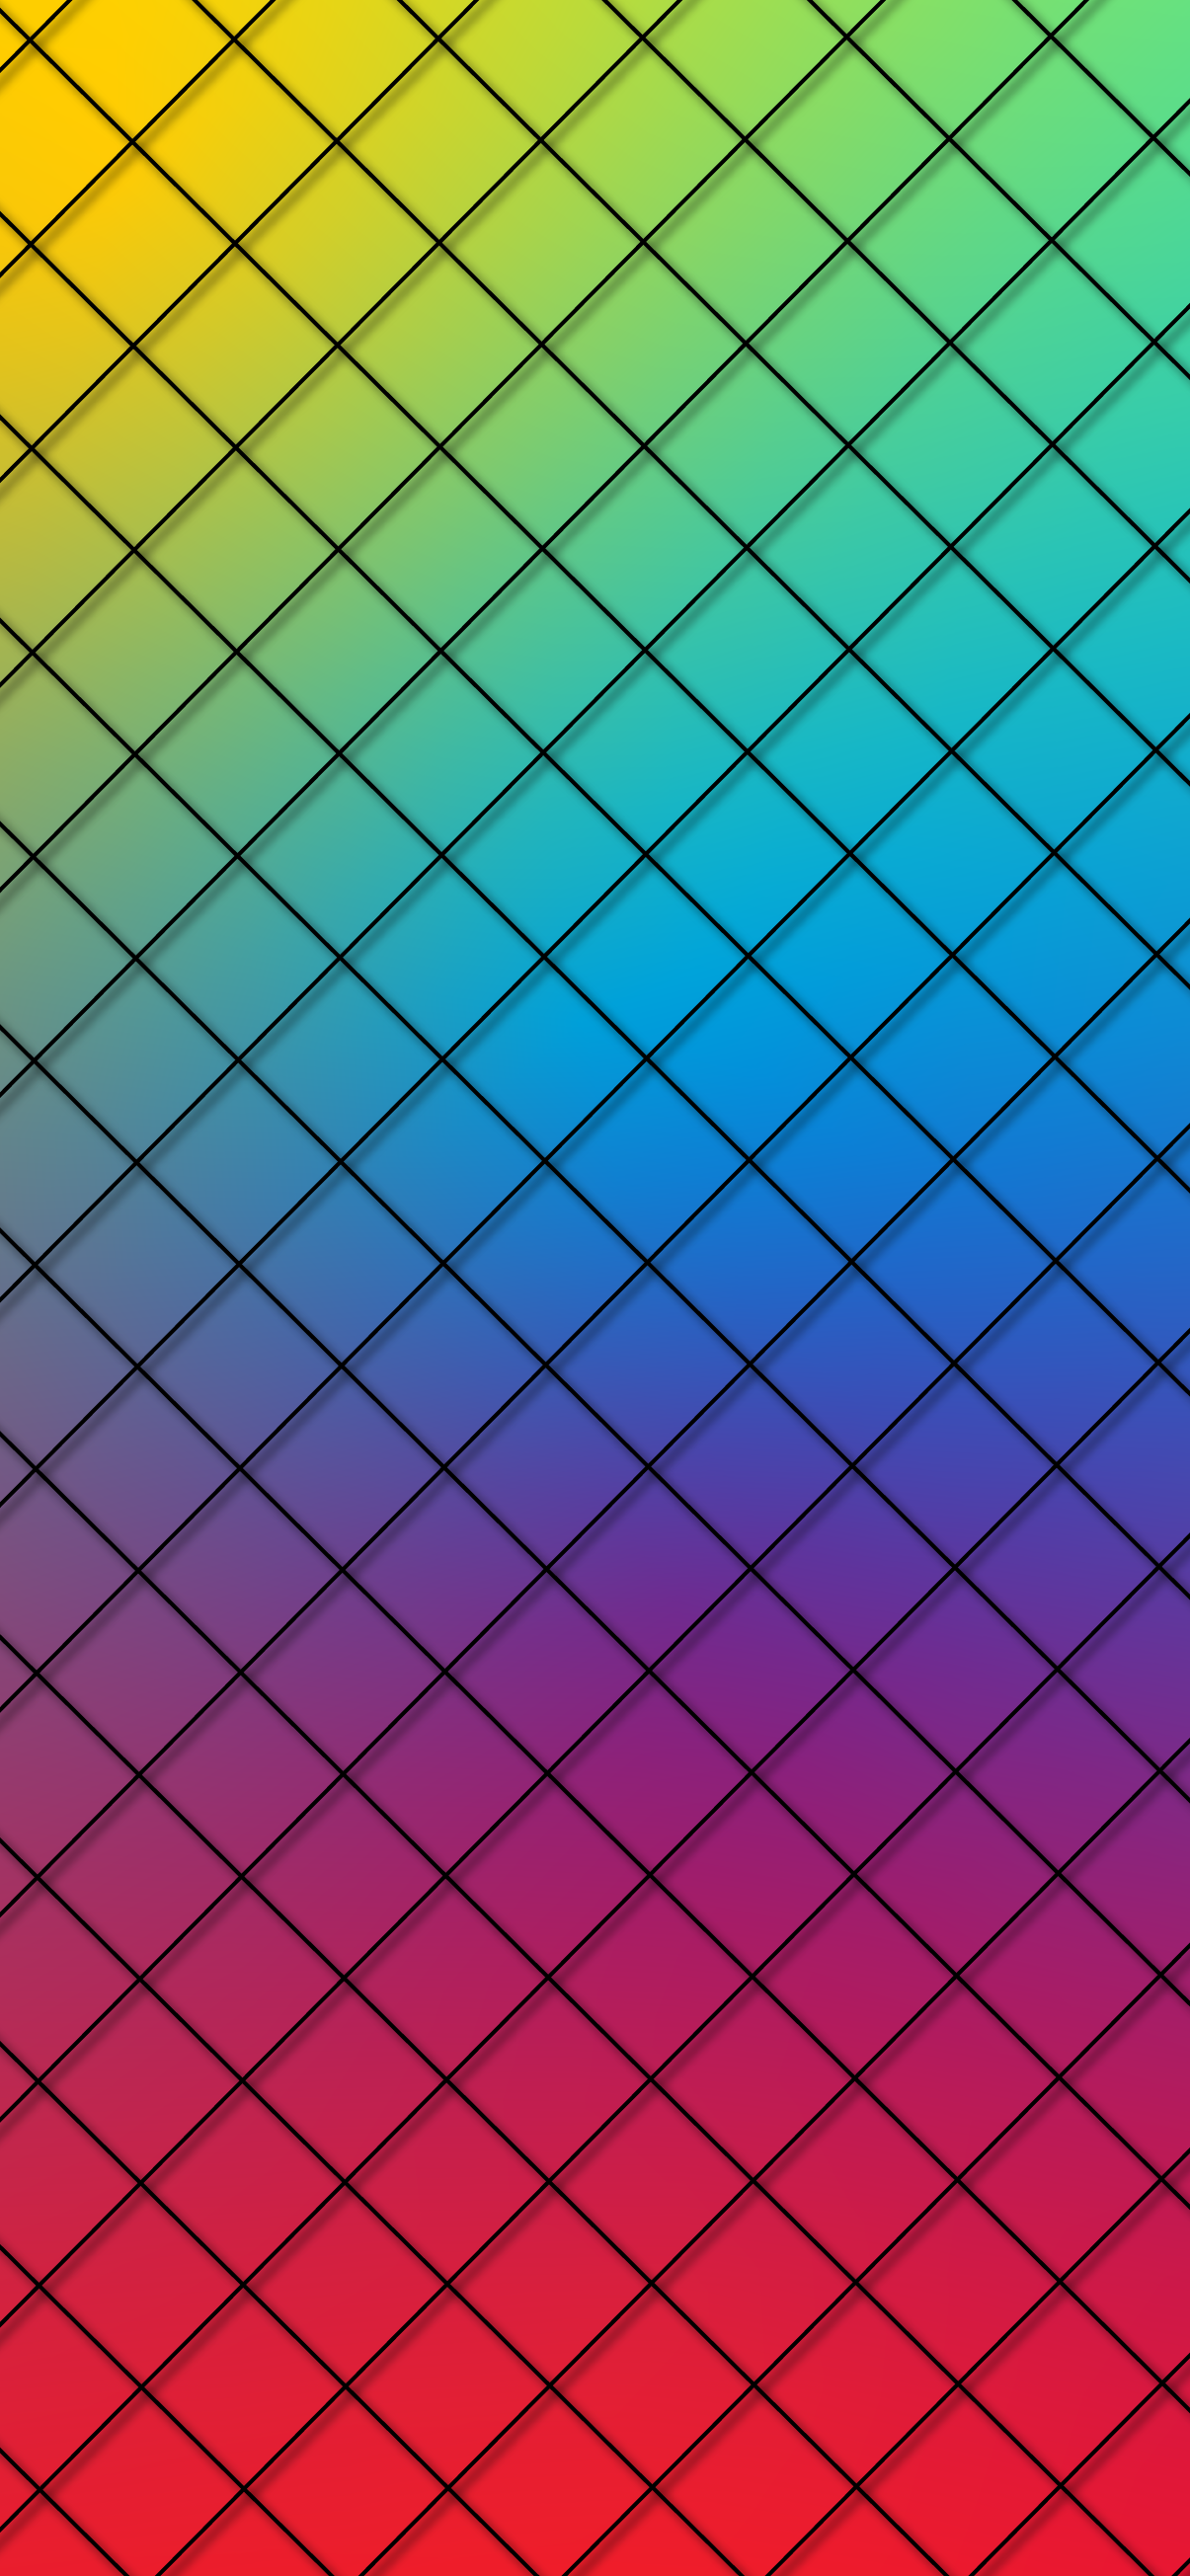 gradient grid wallpaper hd